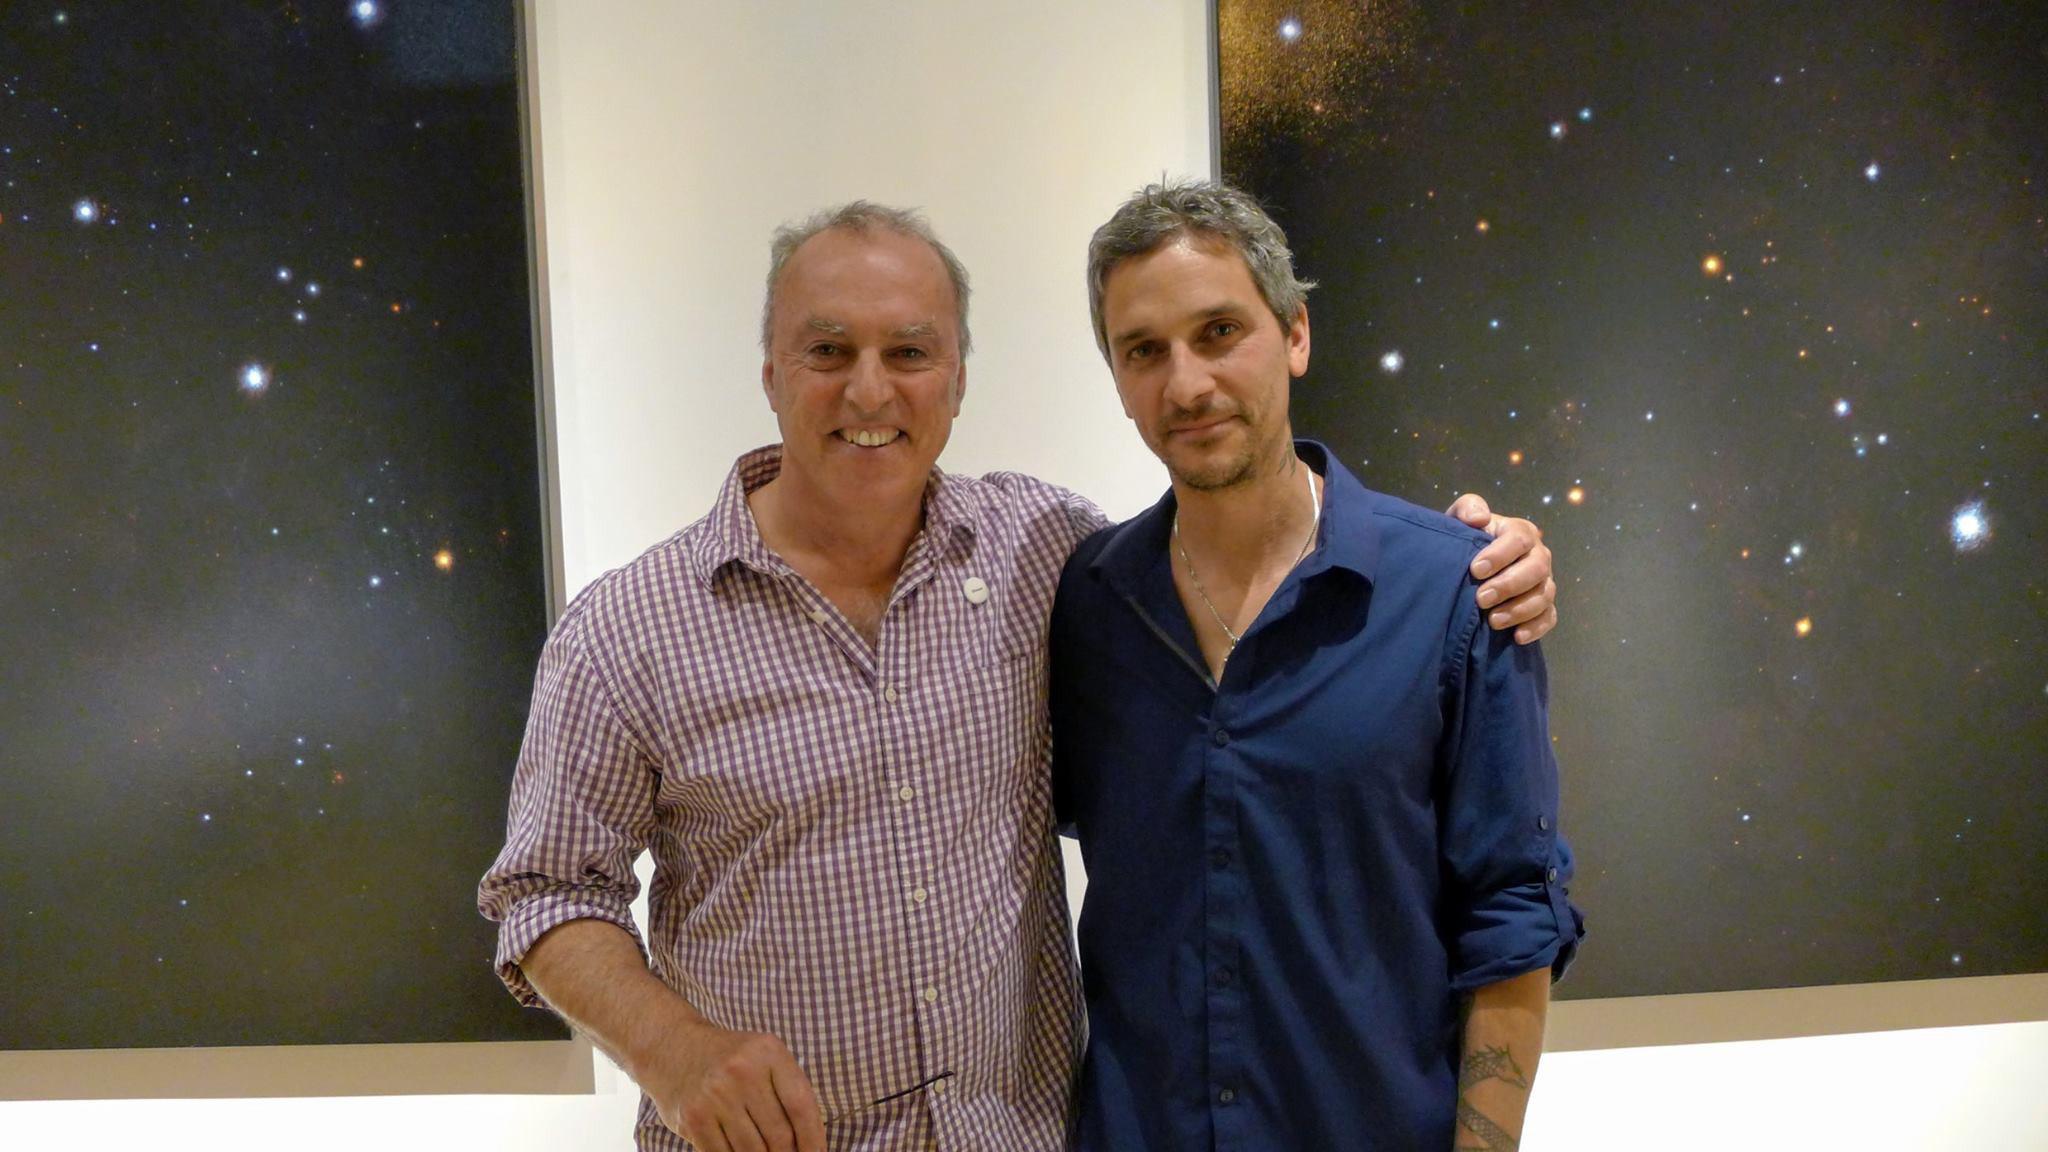 EBK Gallery owner Eric Benkiki and i.